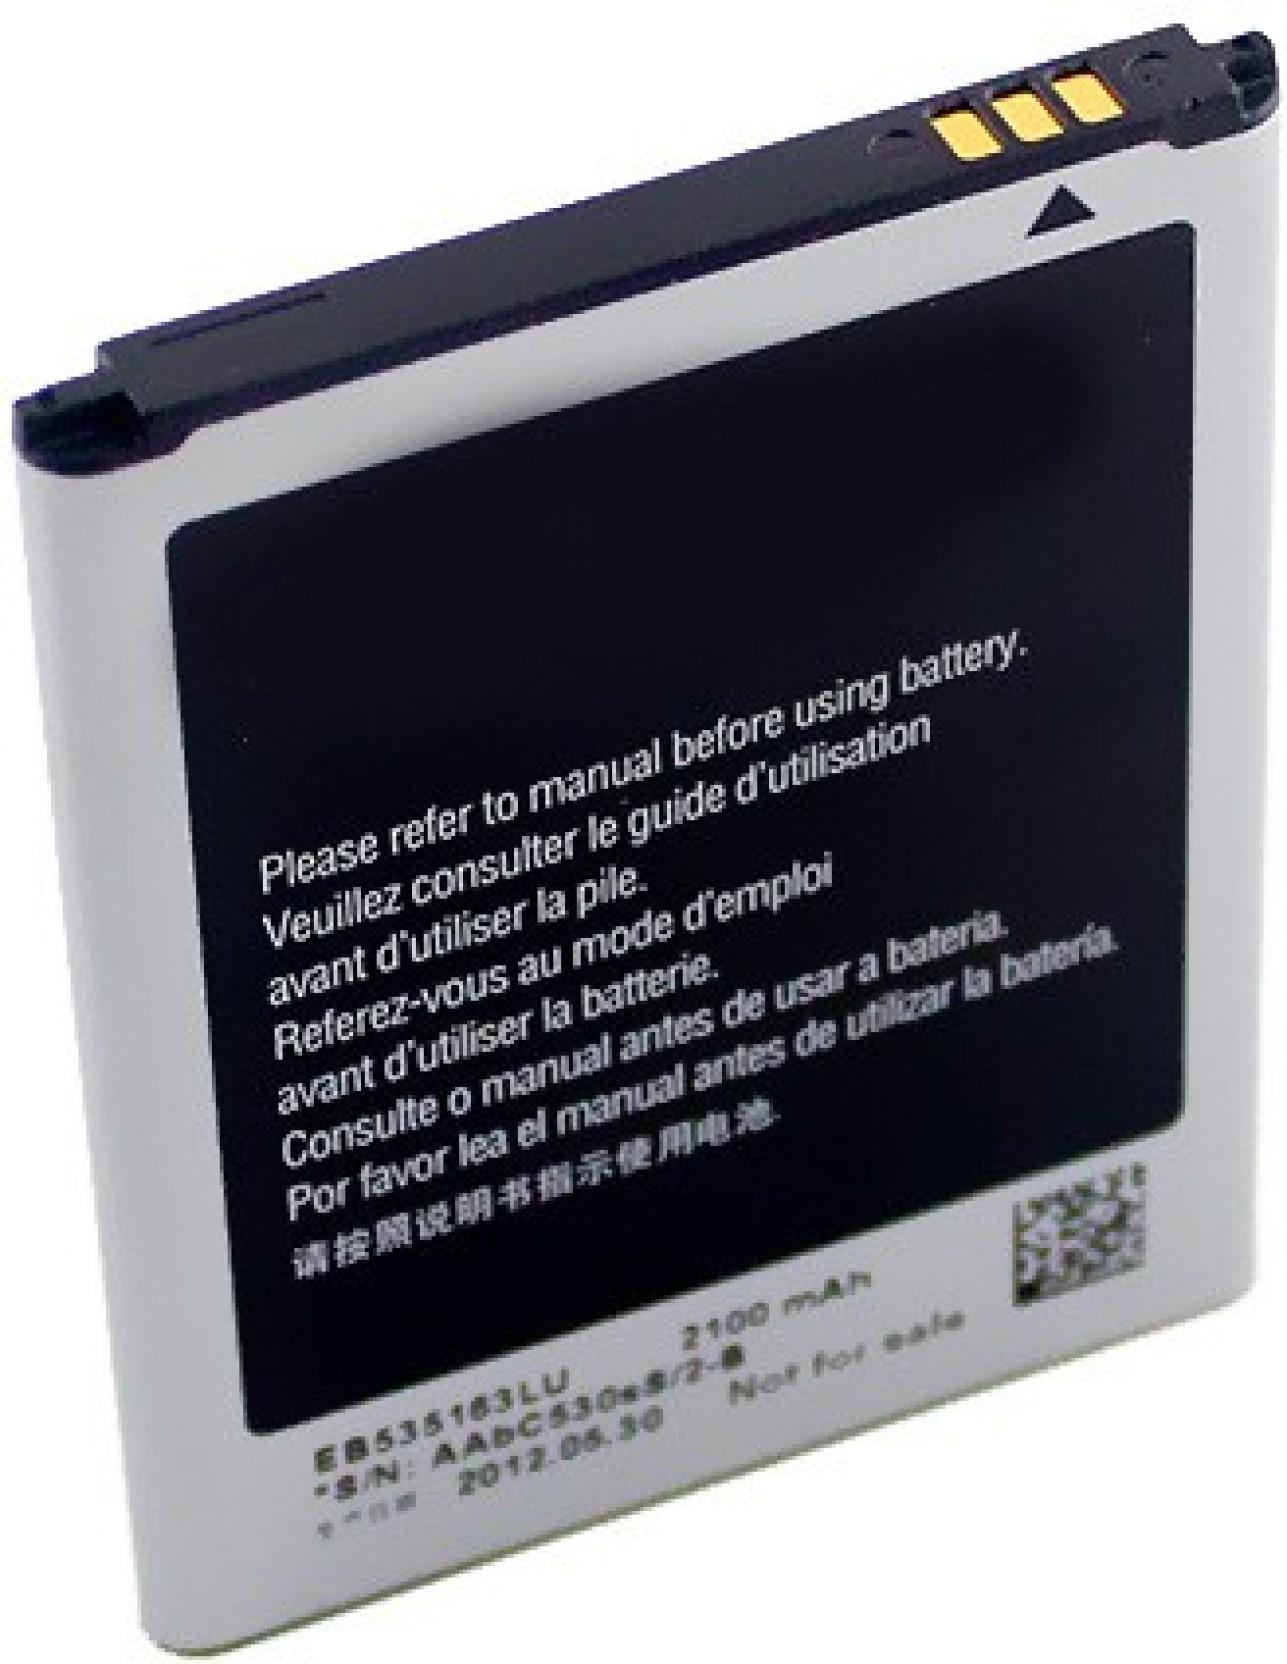 Samsung Mobile Battery For Samsung Galaxy Grand Duos i9082 EB535163LU ( 2100mAh). Share